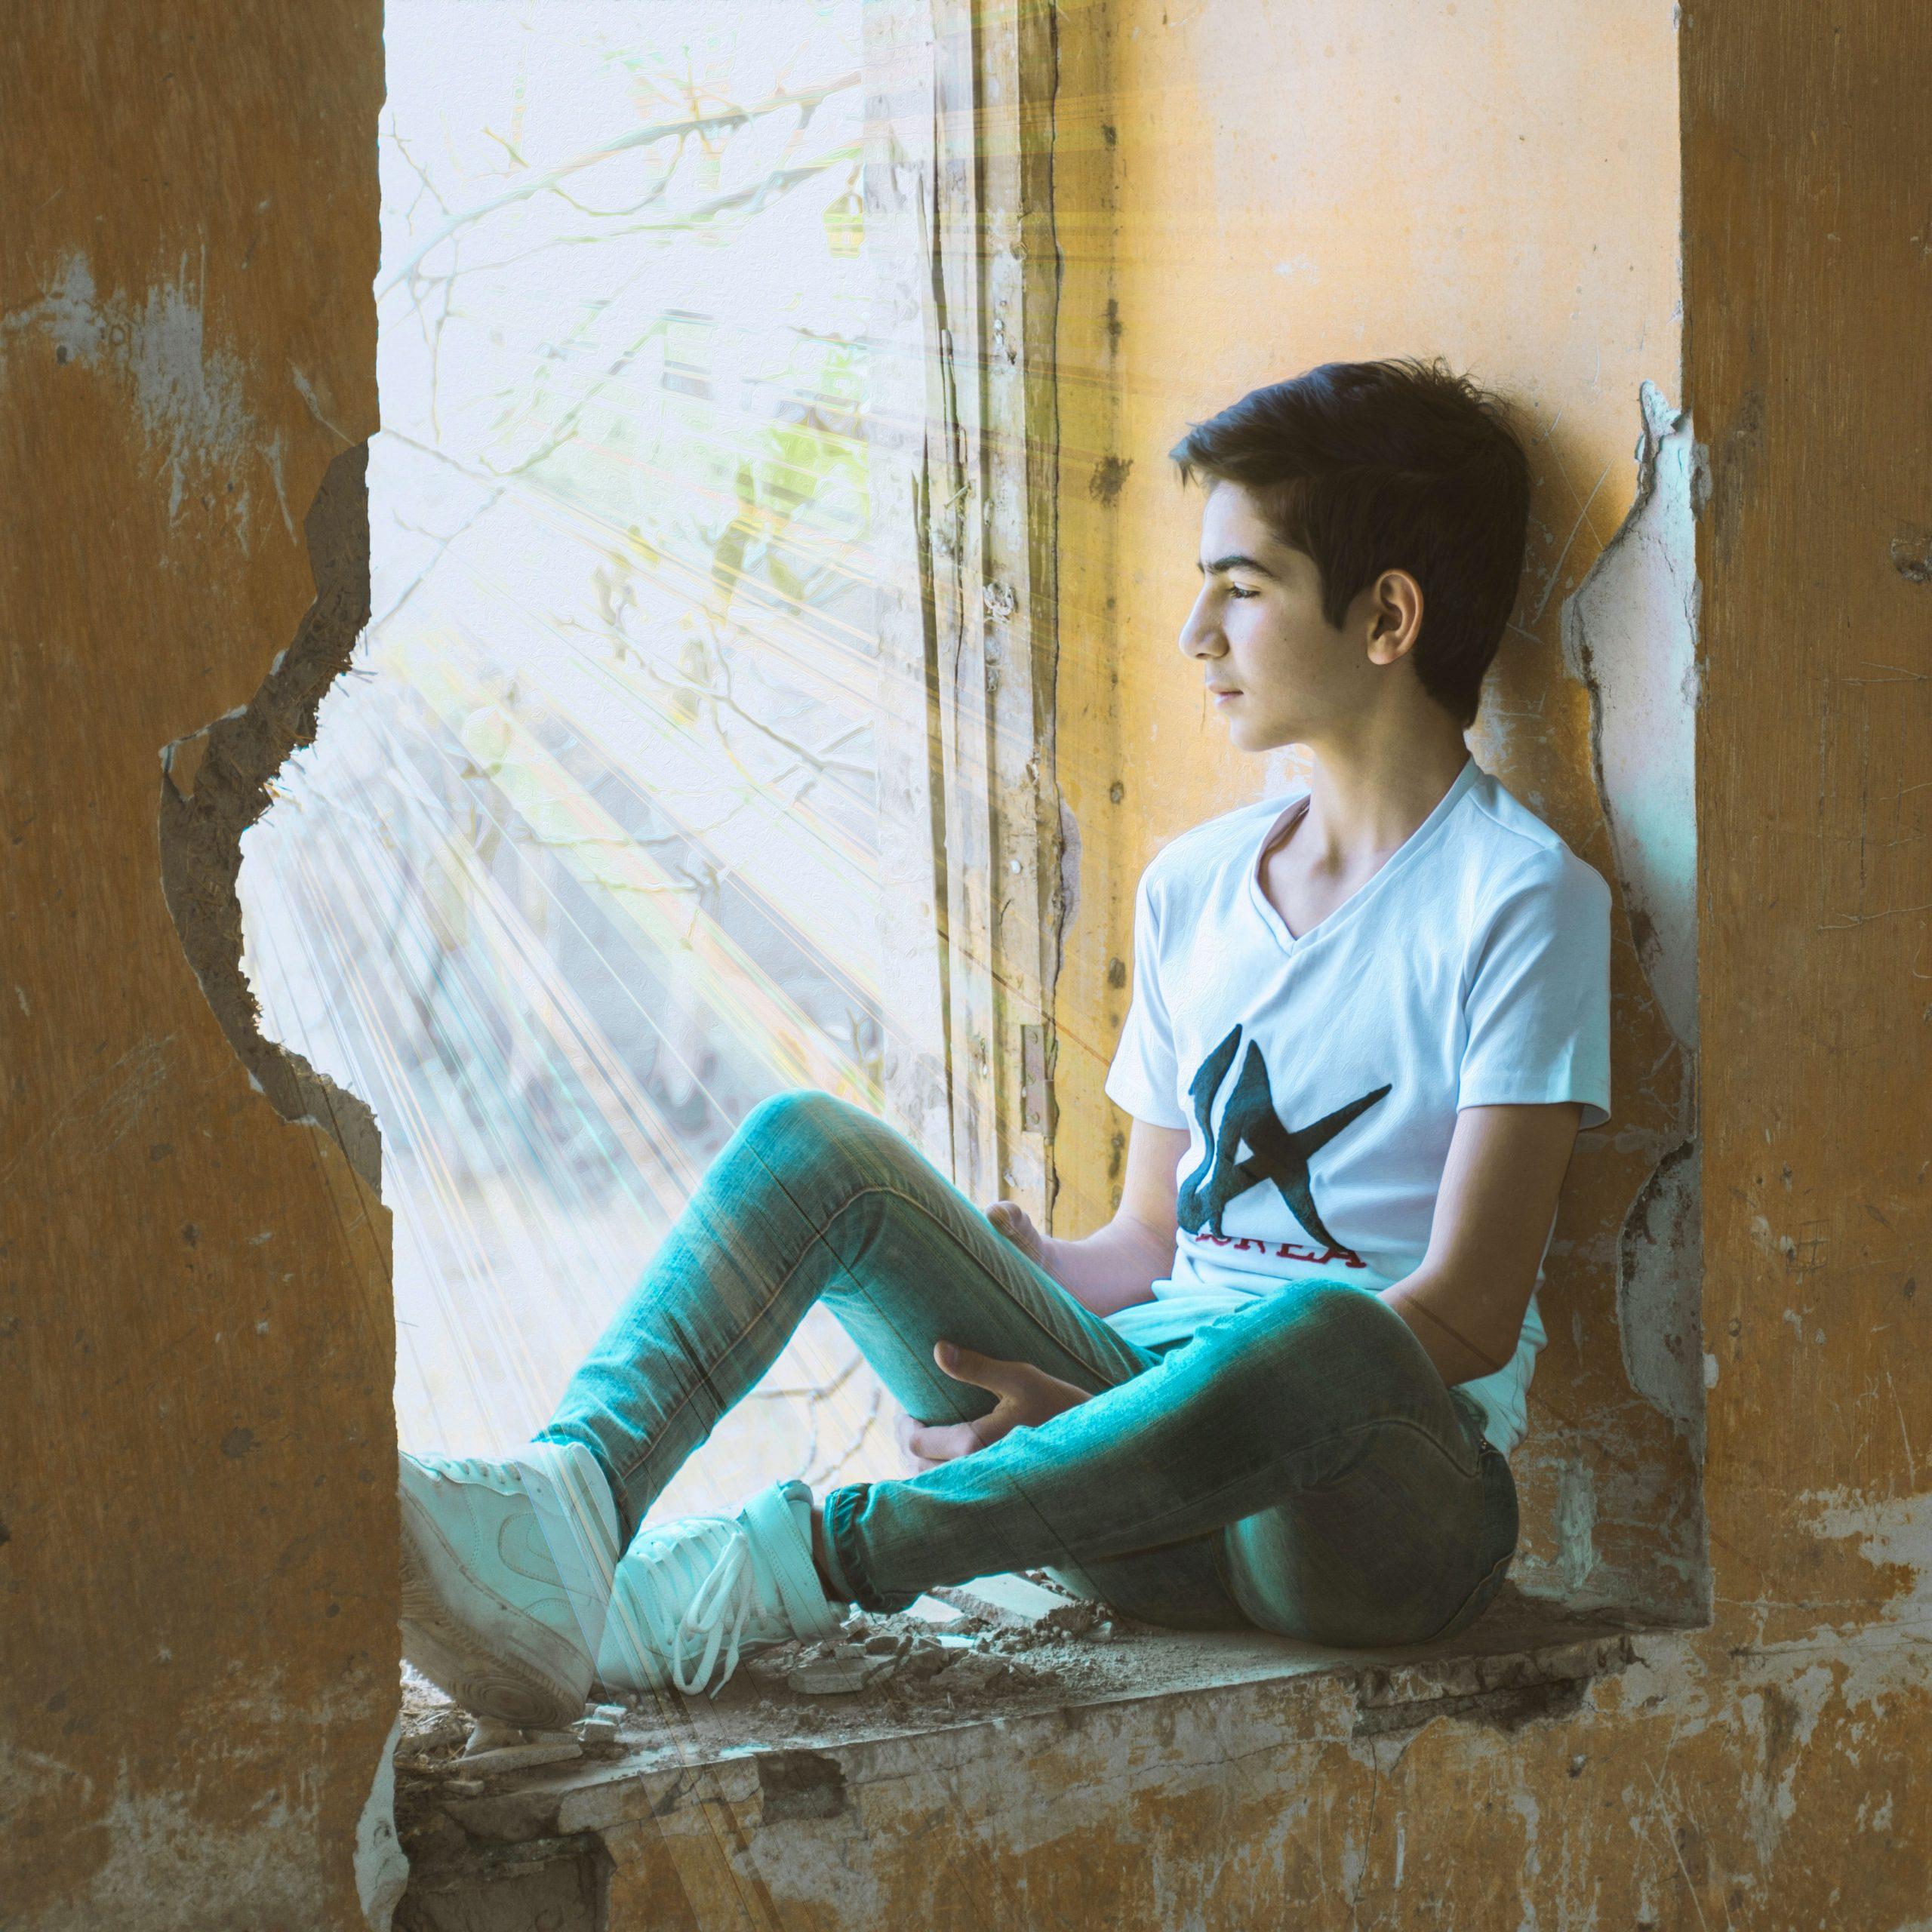 1080p Sad Boy Whatsapp Dp Images pics